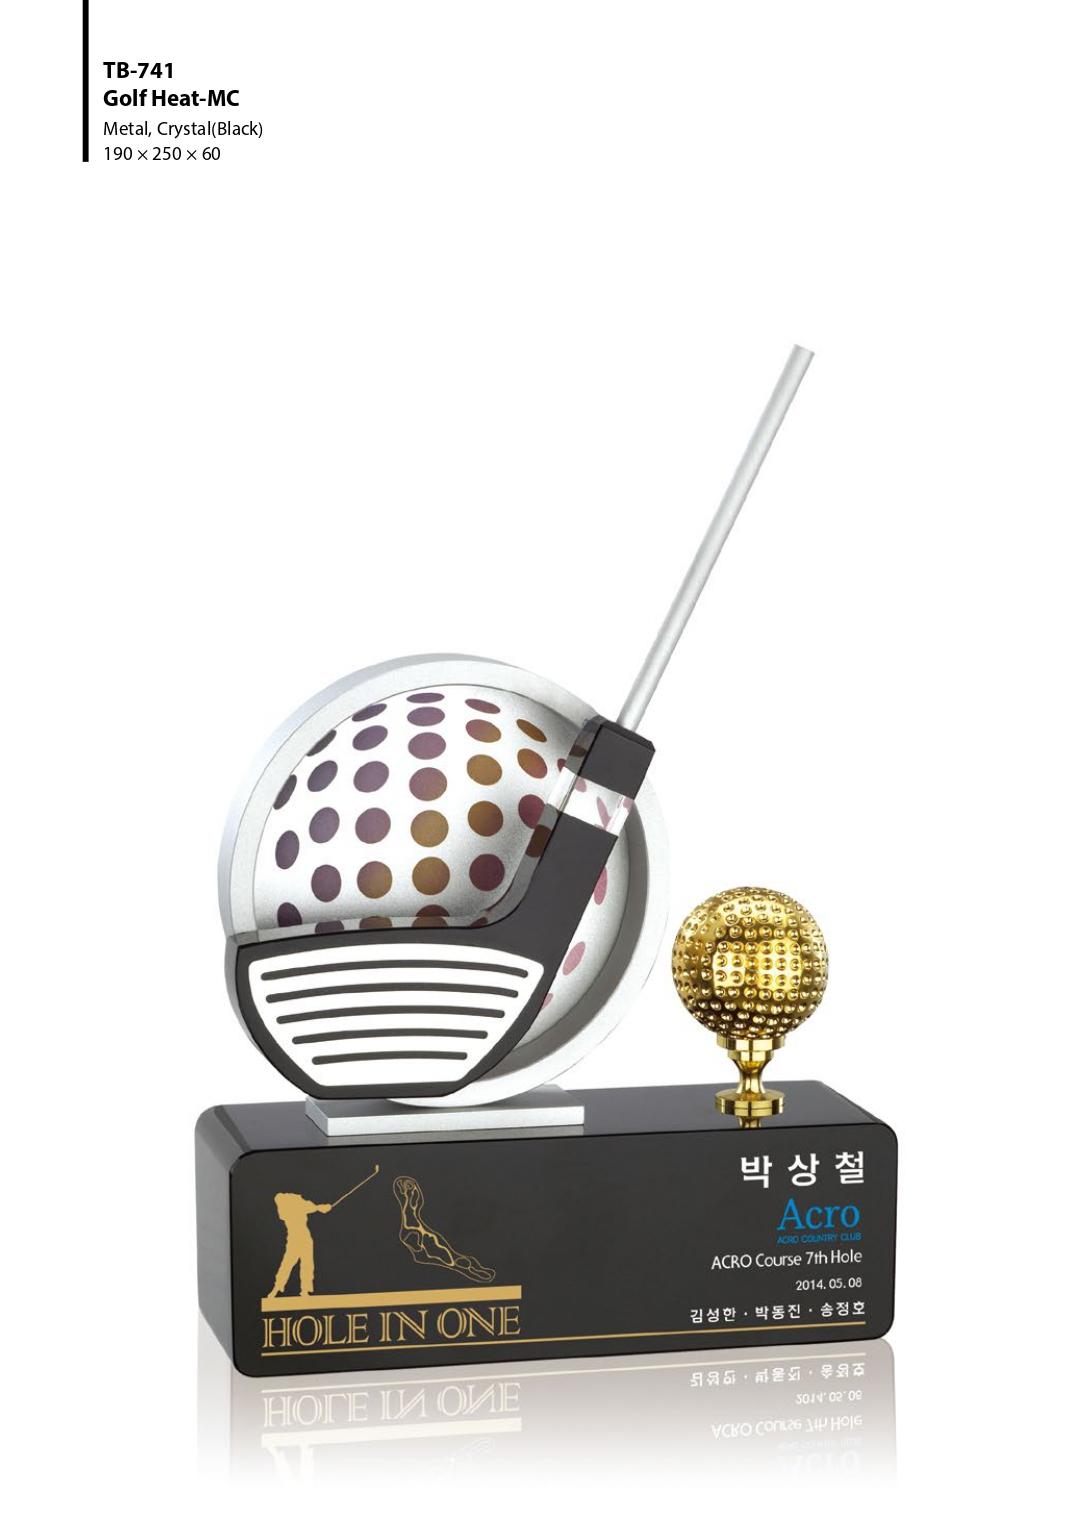 KLPK45041 Golf Heat-MC 홀인원패 골프트로피 상패 트로피 판촉물 제작 케이엘피코리아